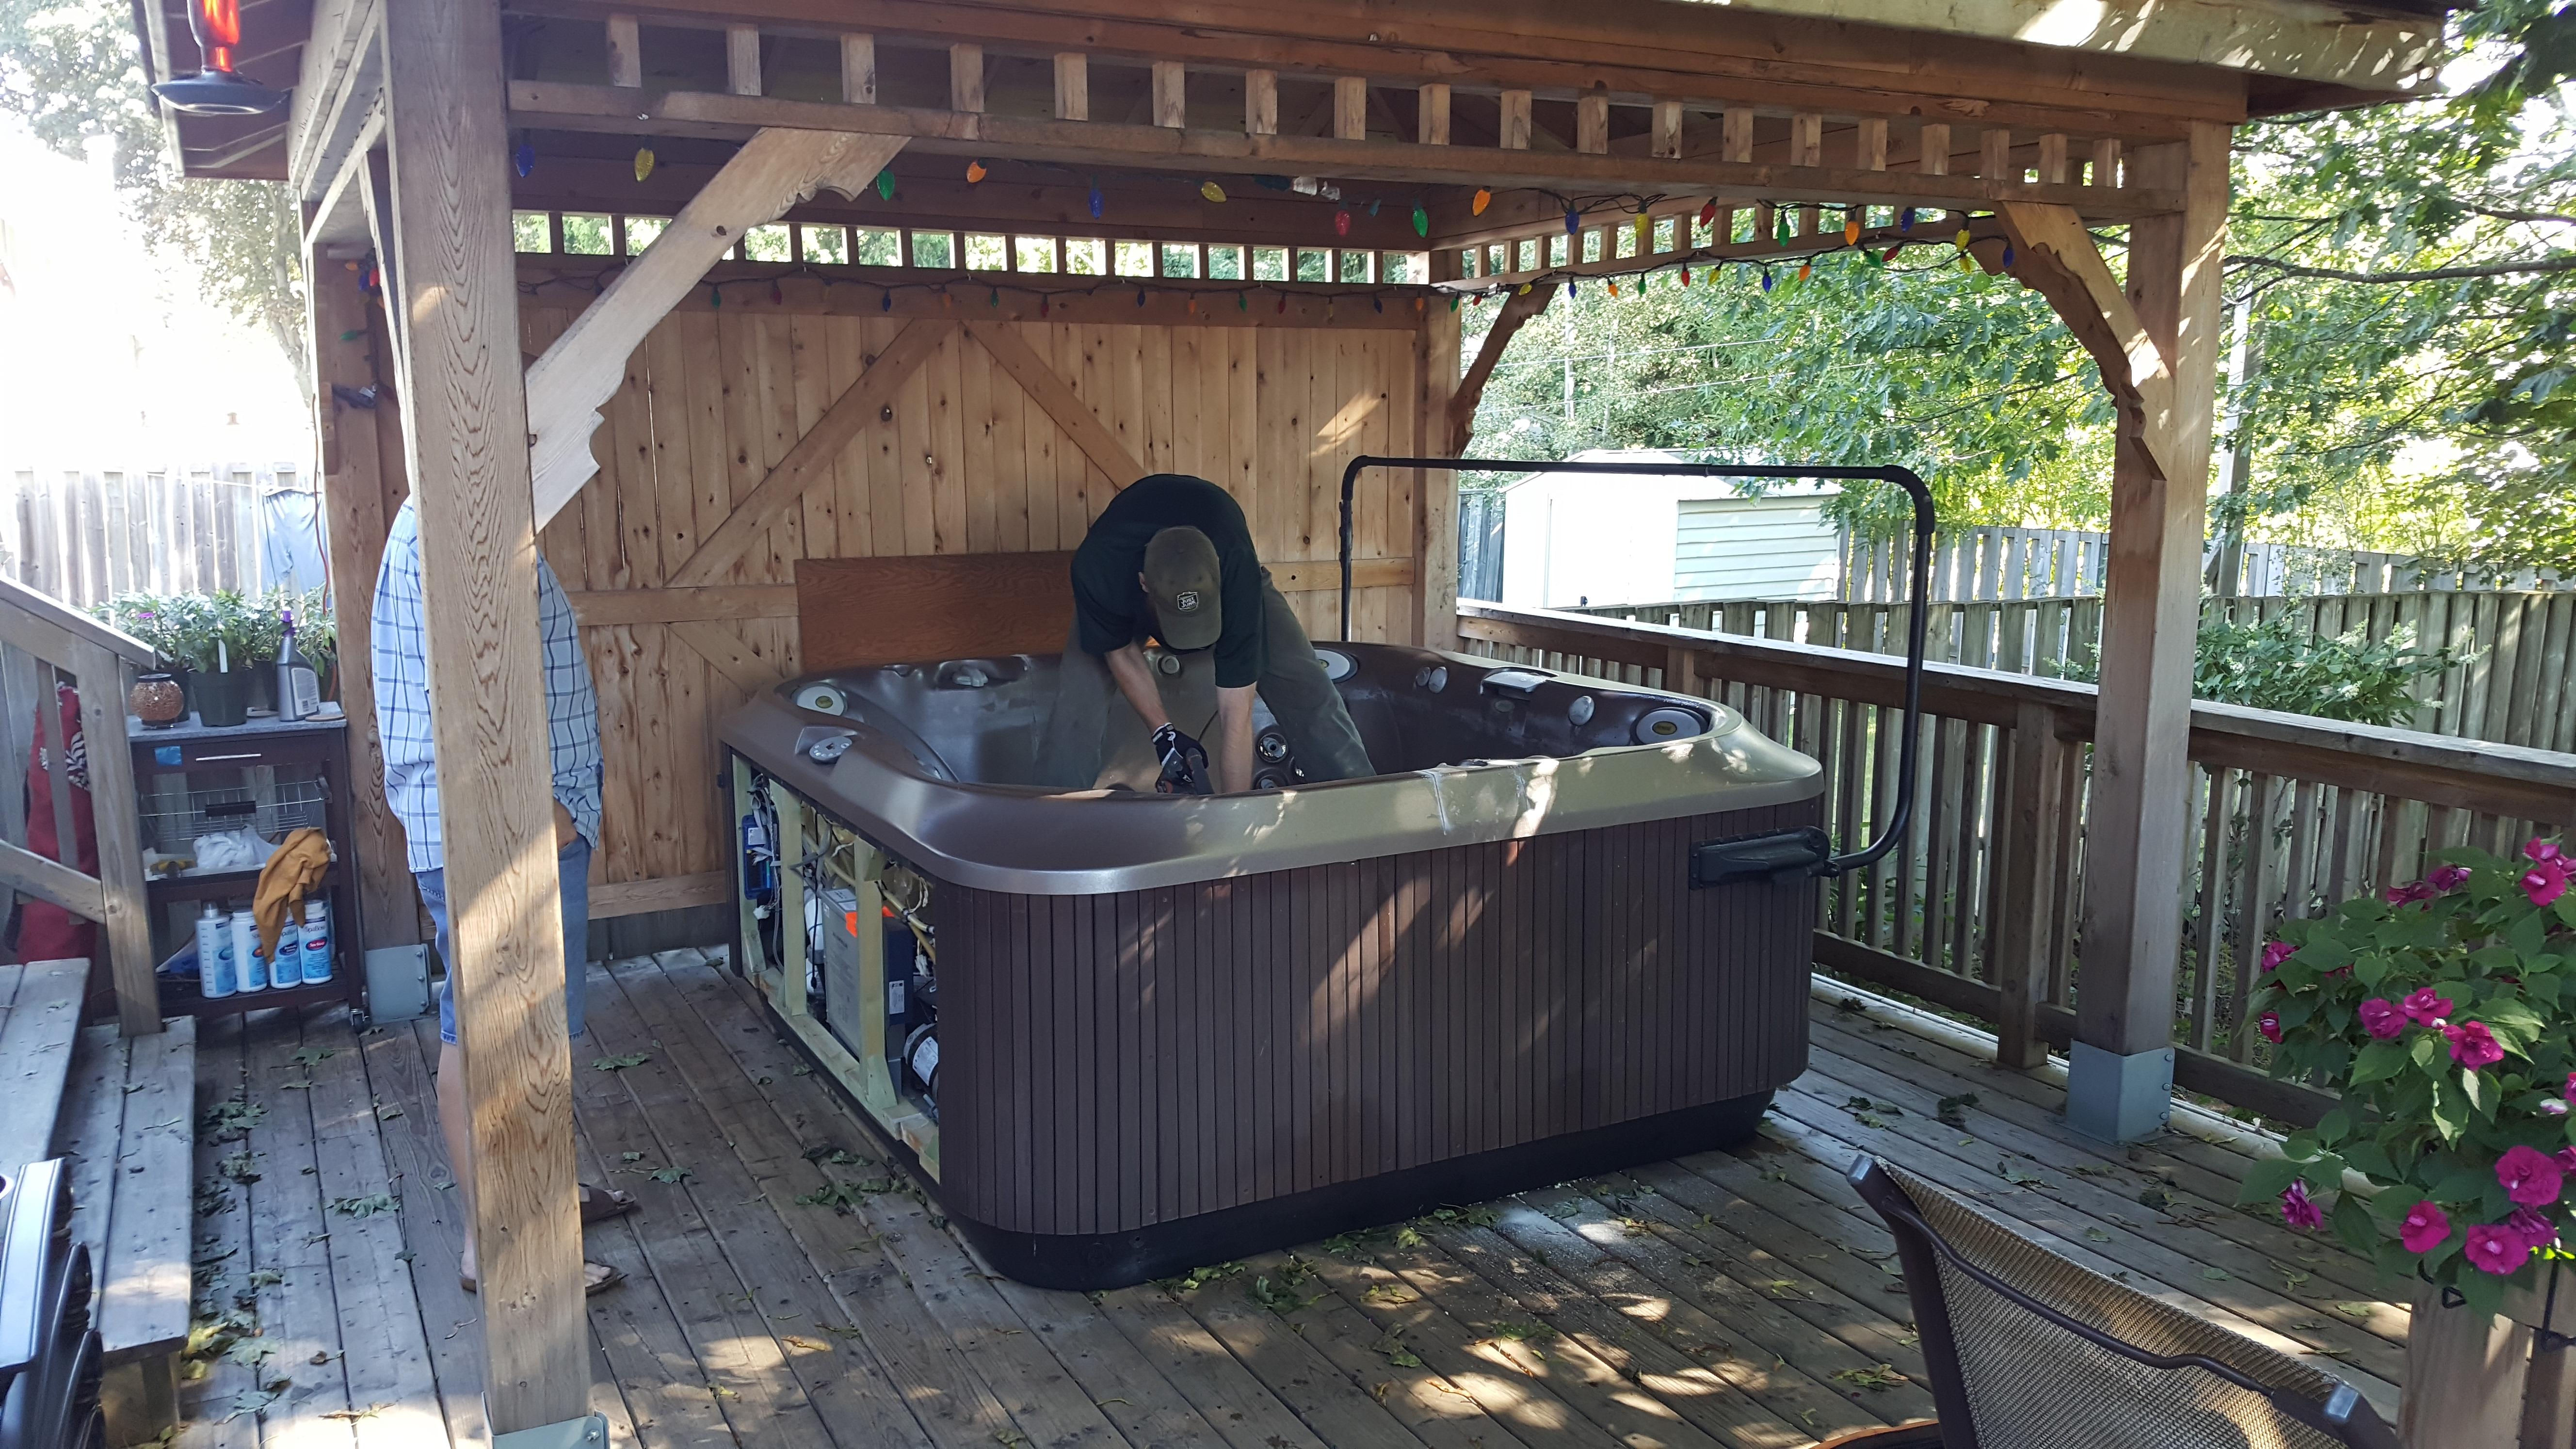 Hot Tub Removal Justjunk Hot Tub Pickup Made Easy